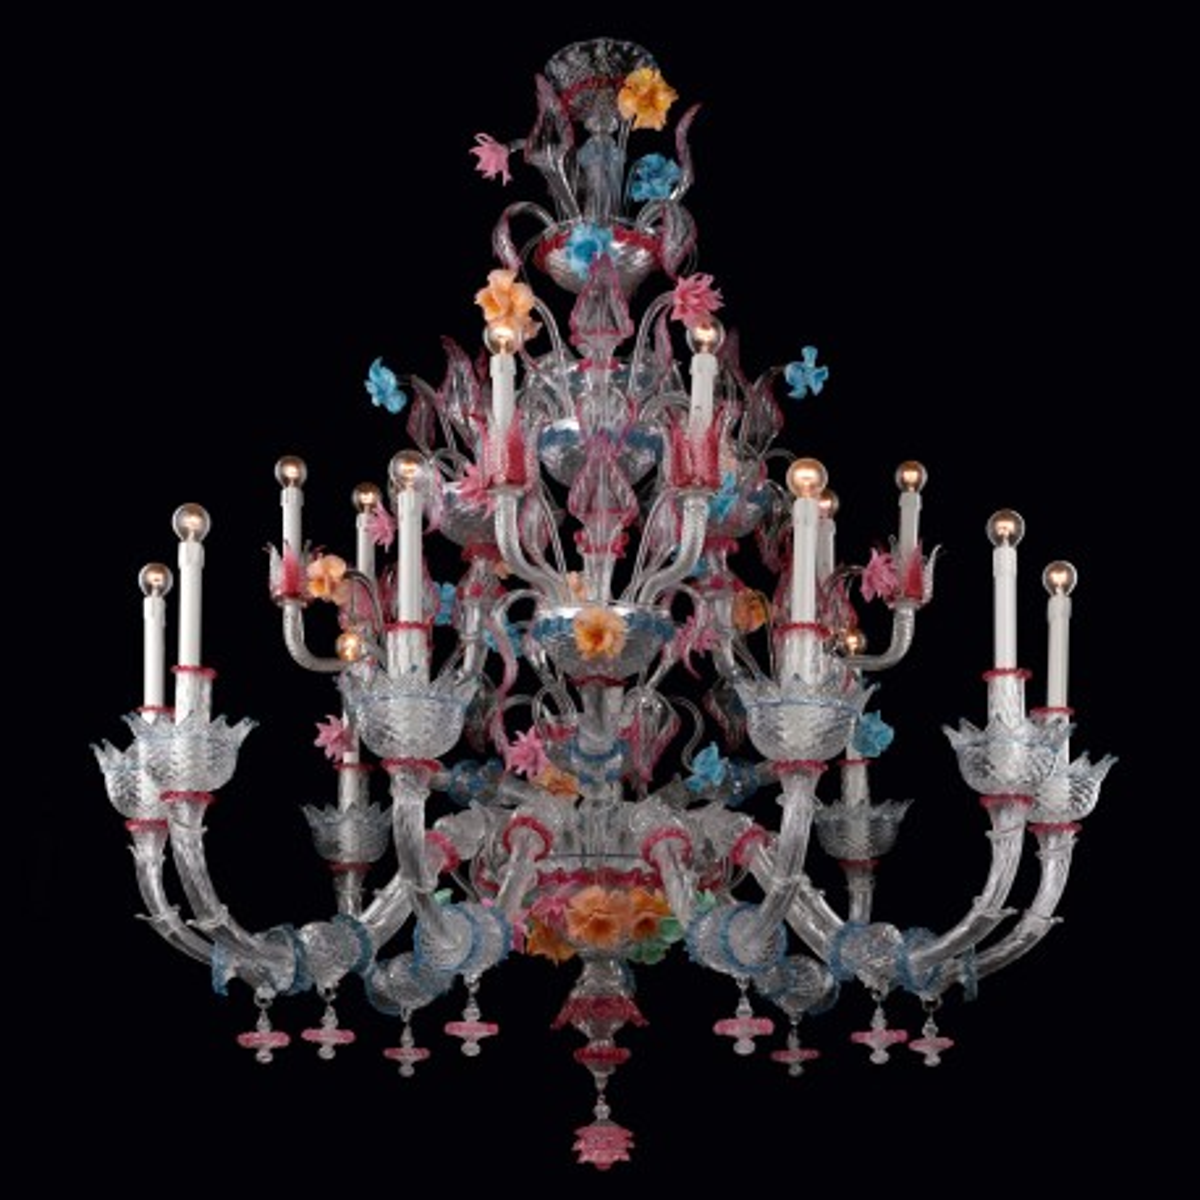 """Romantico"" lampara de cristal de Murano - 15 luces"